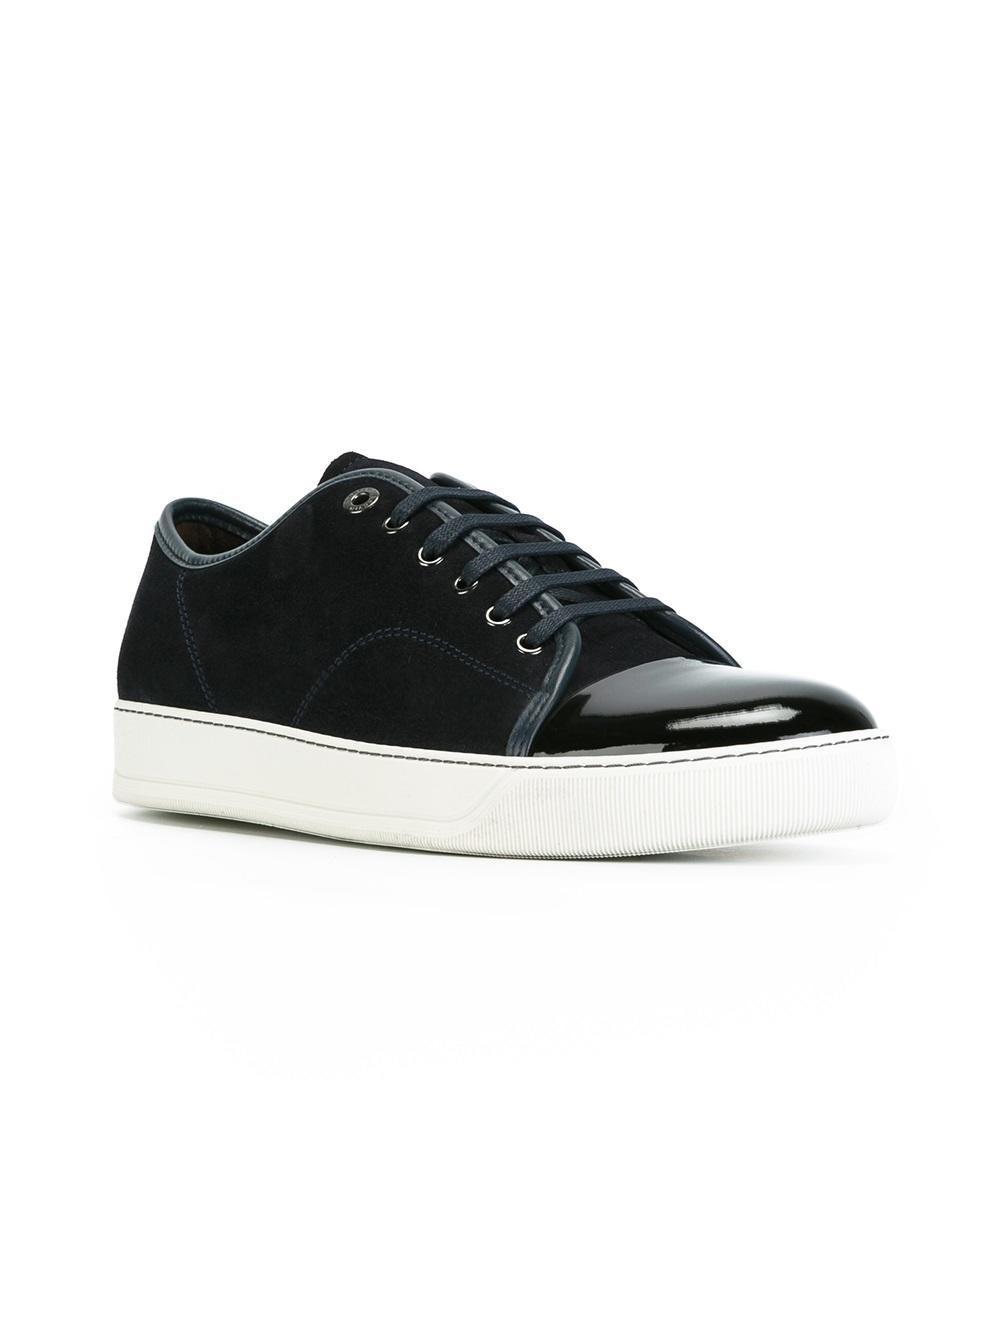 d6576207678 Lanvin - Black Toe-capped Sneakers for Men - Lyst. View fullscreen